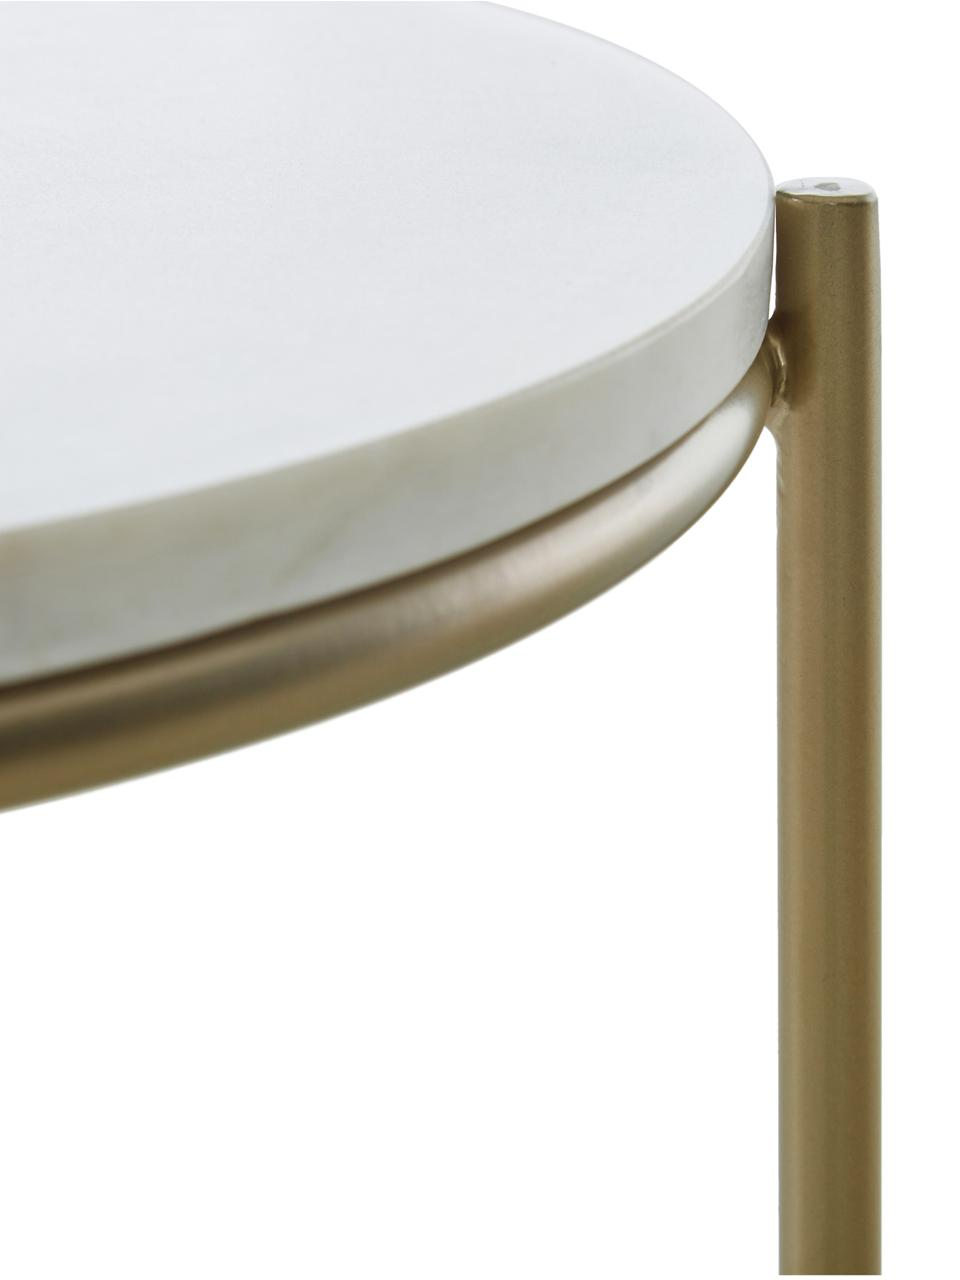 Ronde marmeren bijzettafel Ella, Tafelblad: marmer, Frame: gepoedercoat metaal, Tafelblad: wit marmer. Frame: mat goudkleurig, Ø 40 x H 50 cm